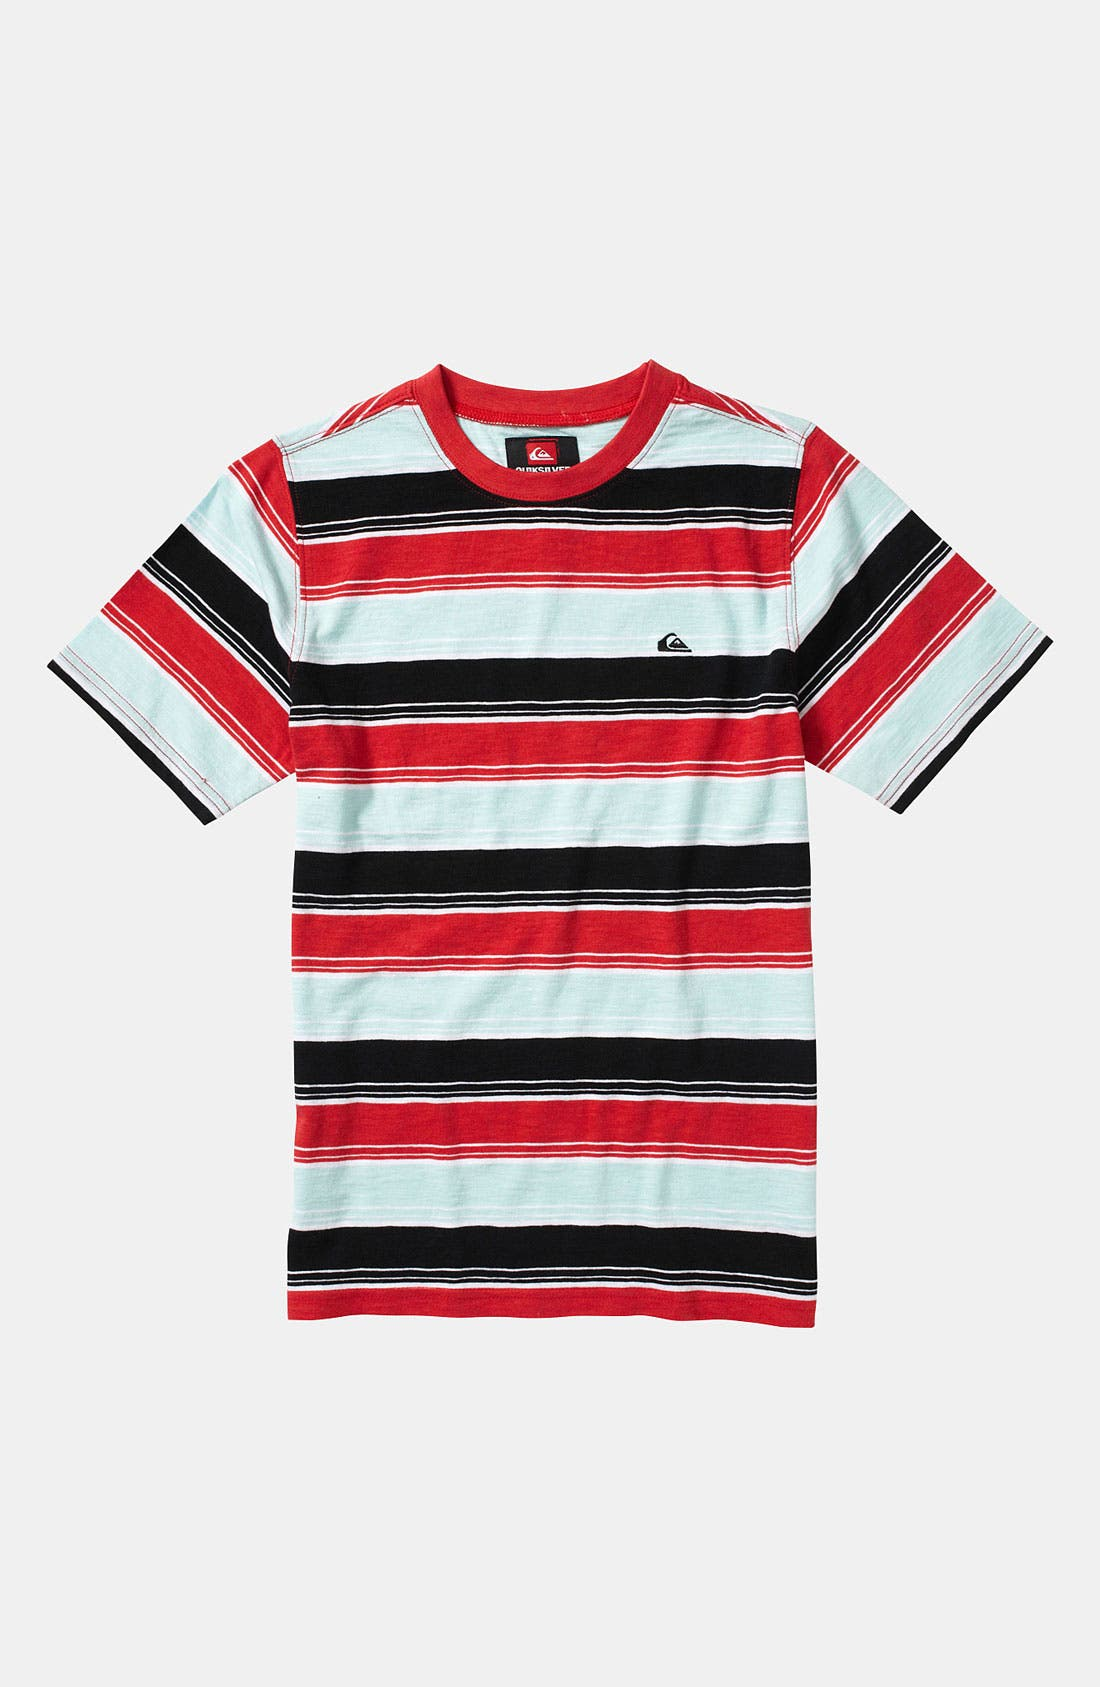 Alternate Image 1 Selected - Quiksilver 'Downside' T-Shirt (Little Boys)